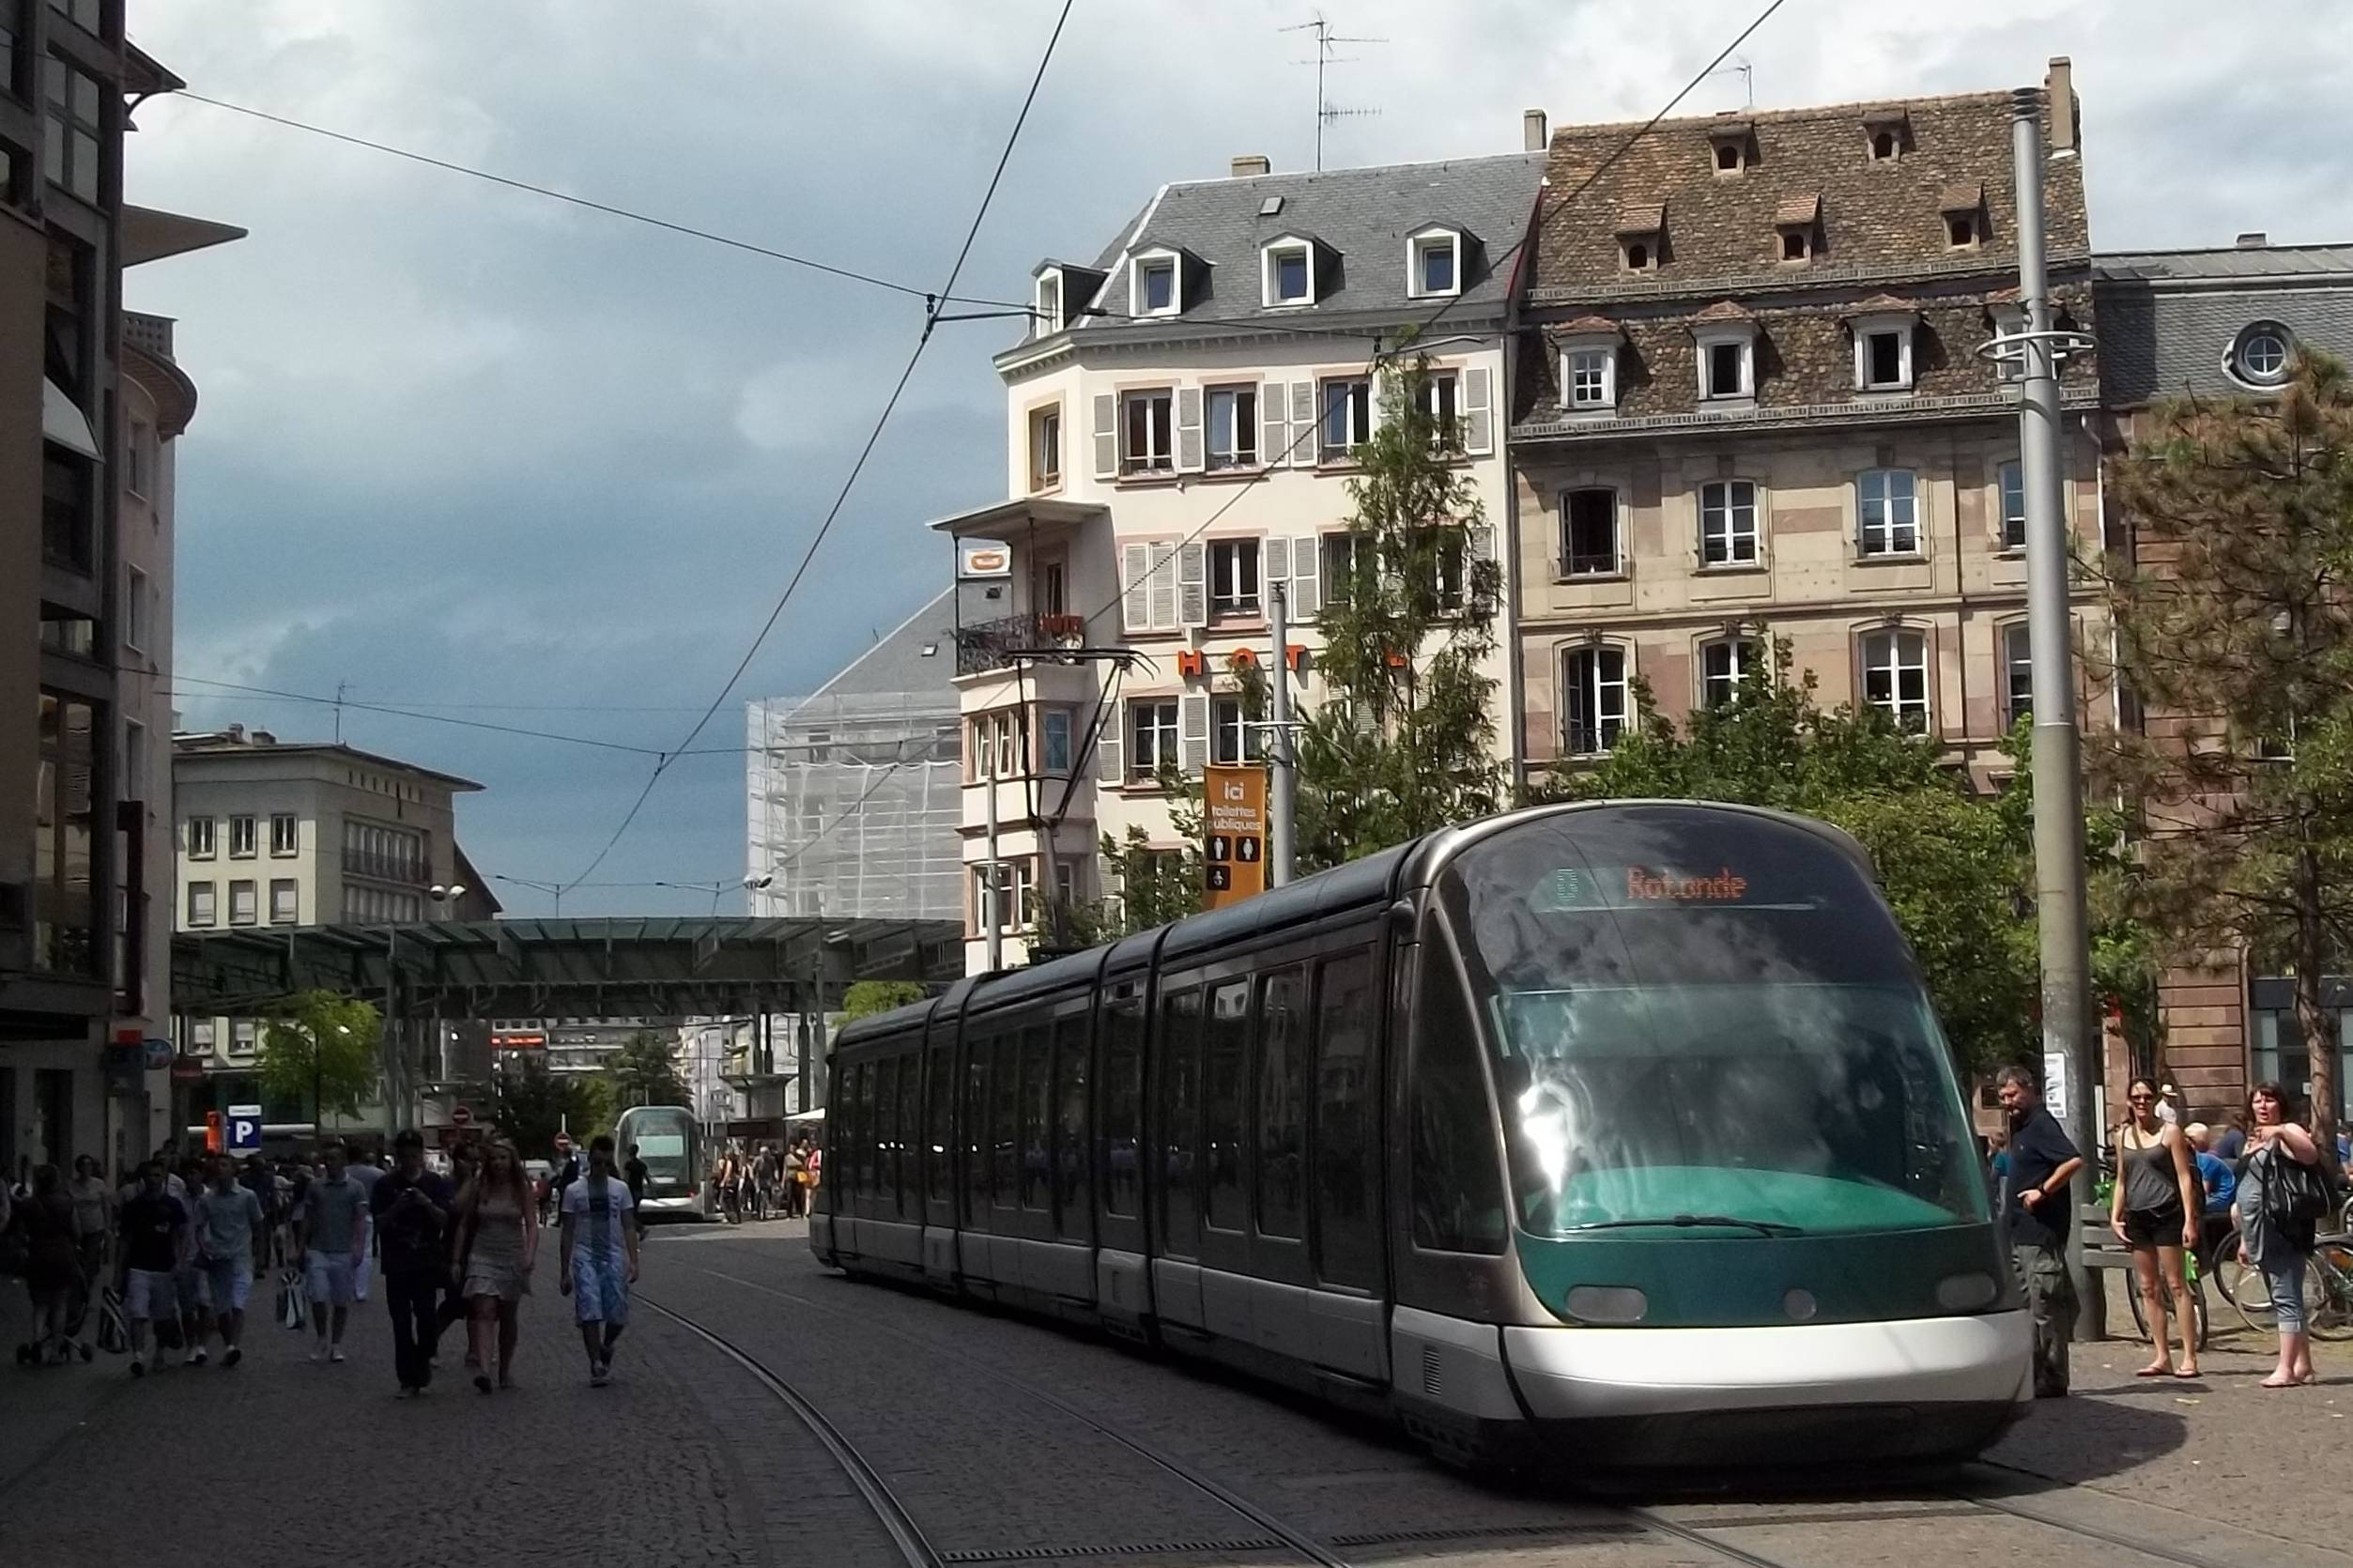 Eurotram approaching Place de l'Homme de Fer.